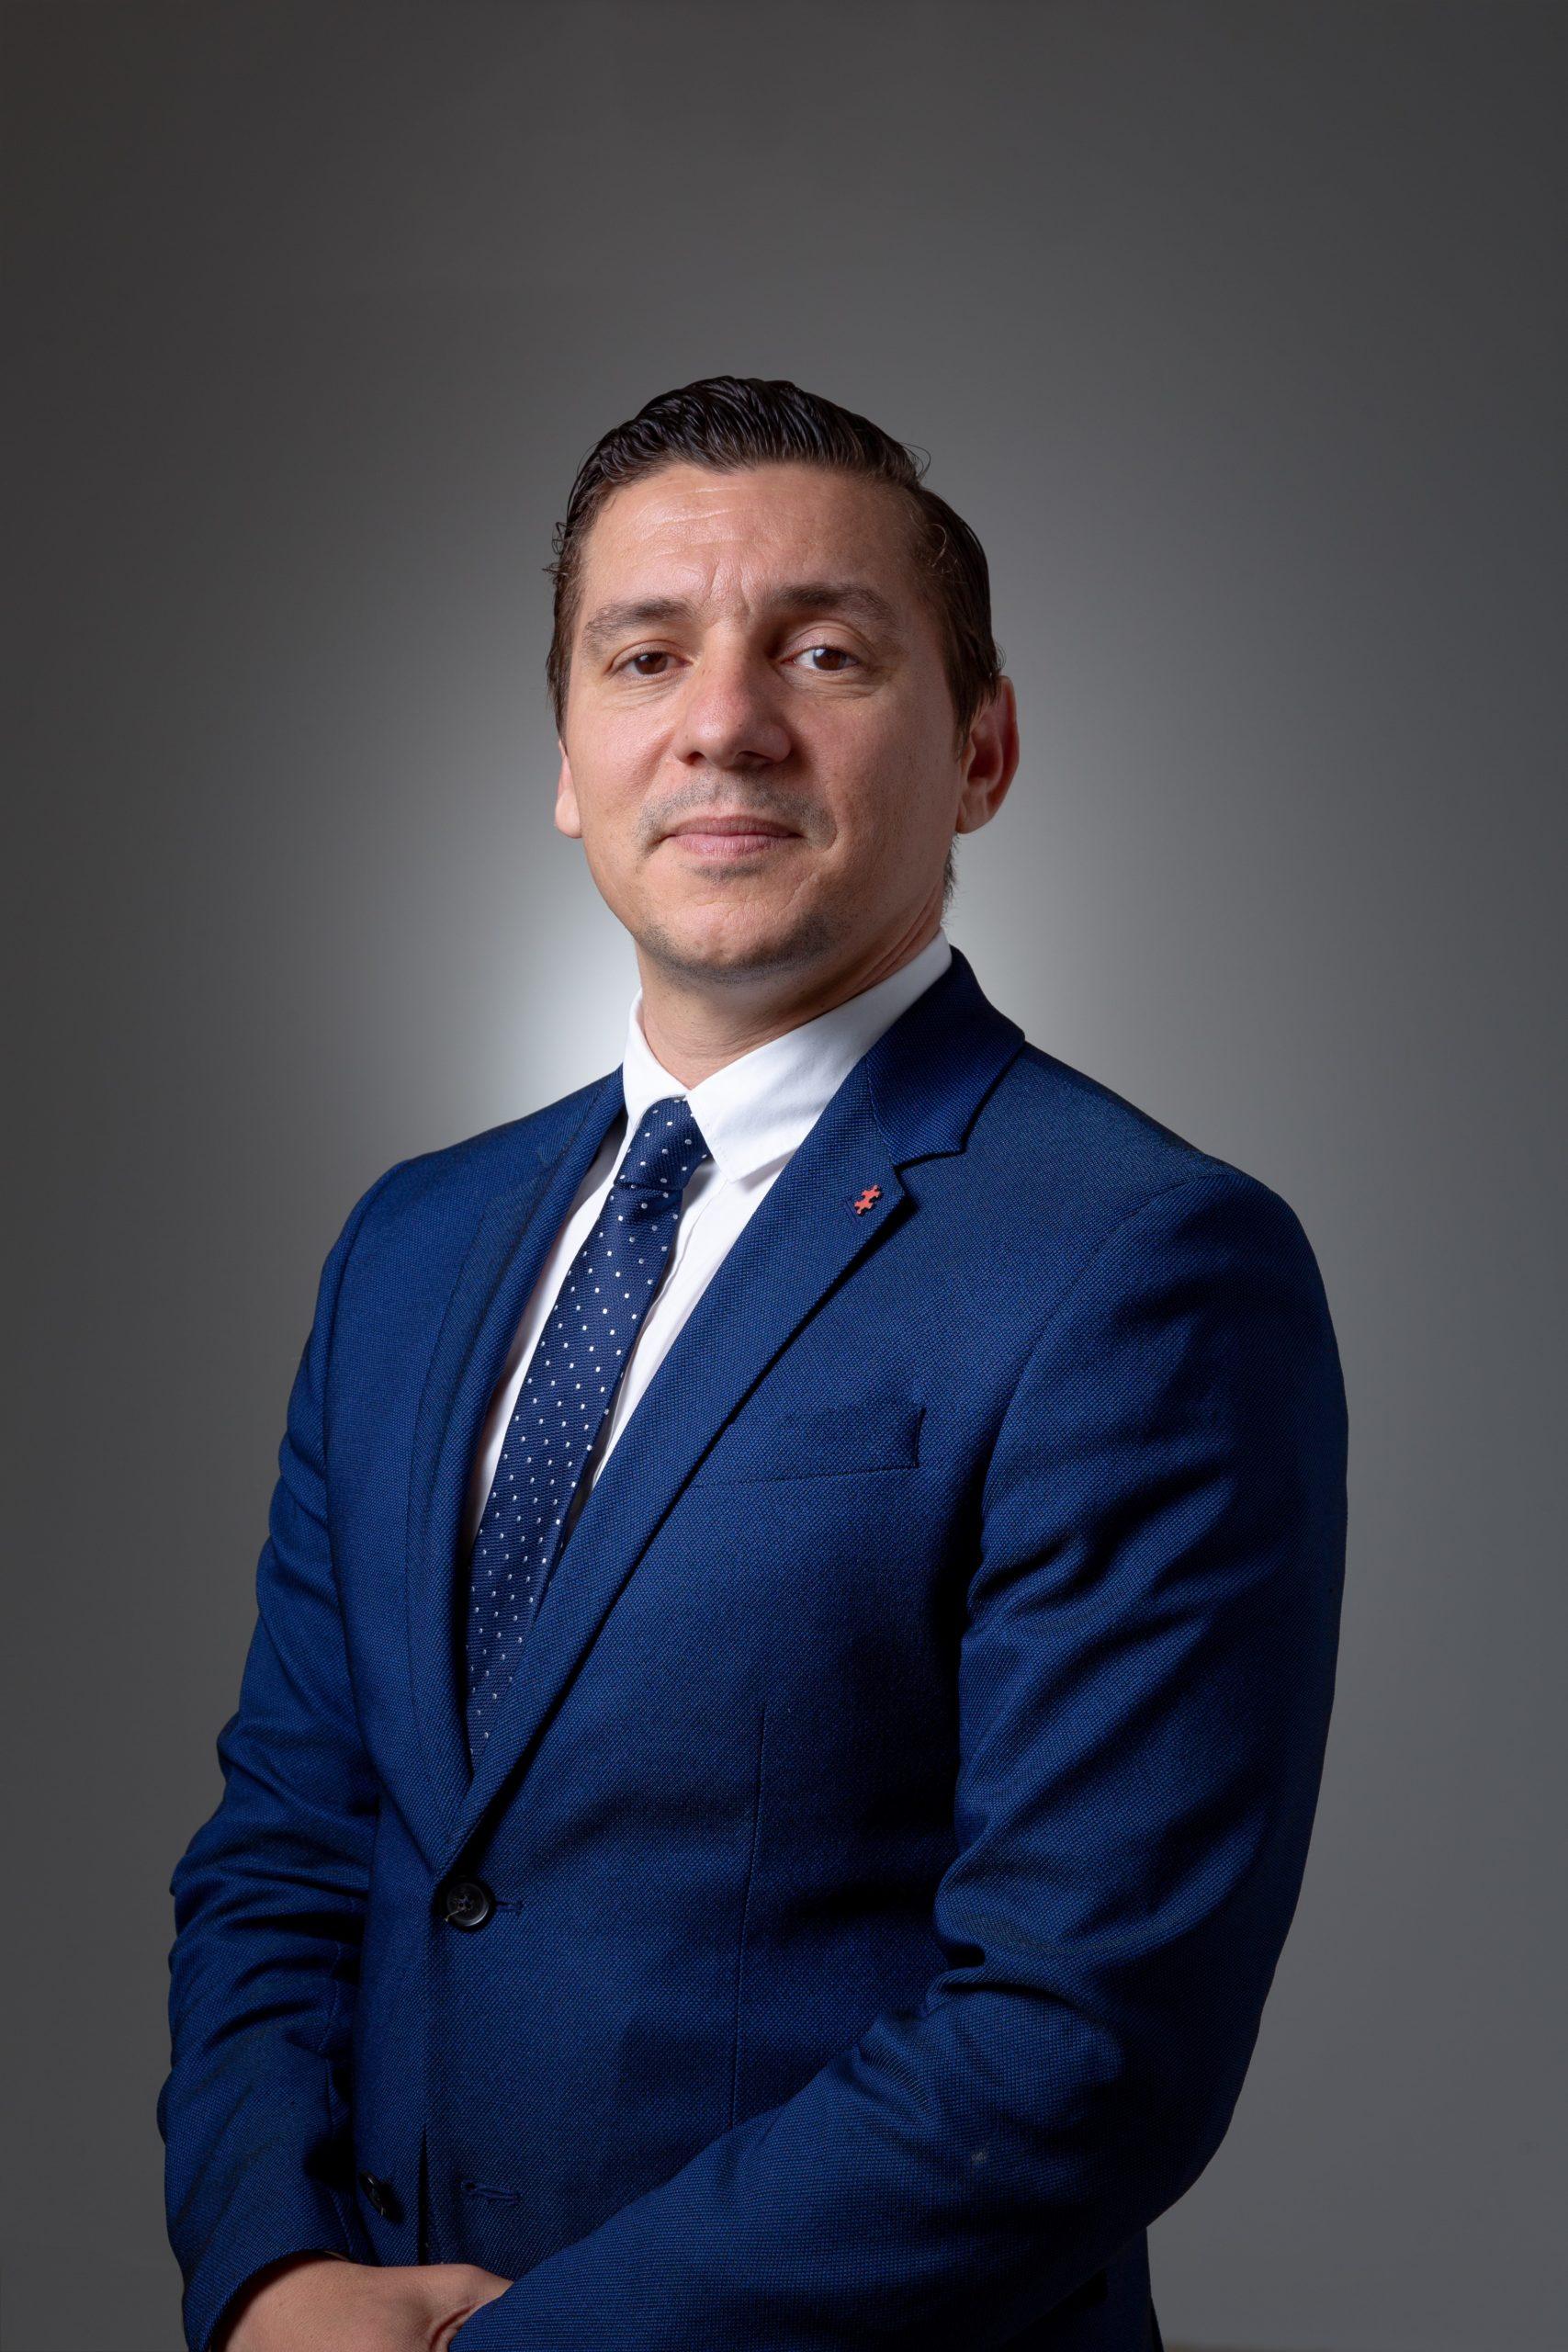 Mehdi Baklouti